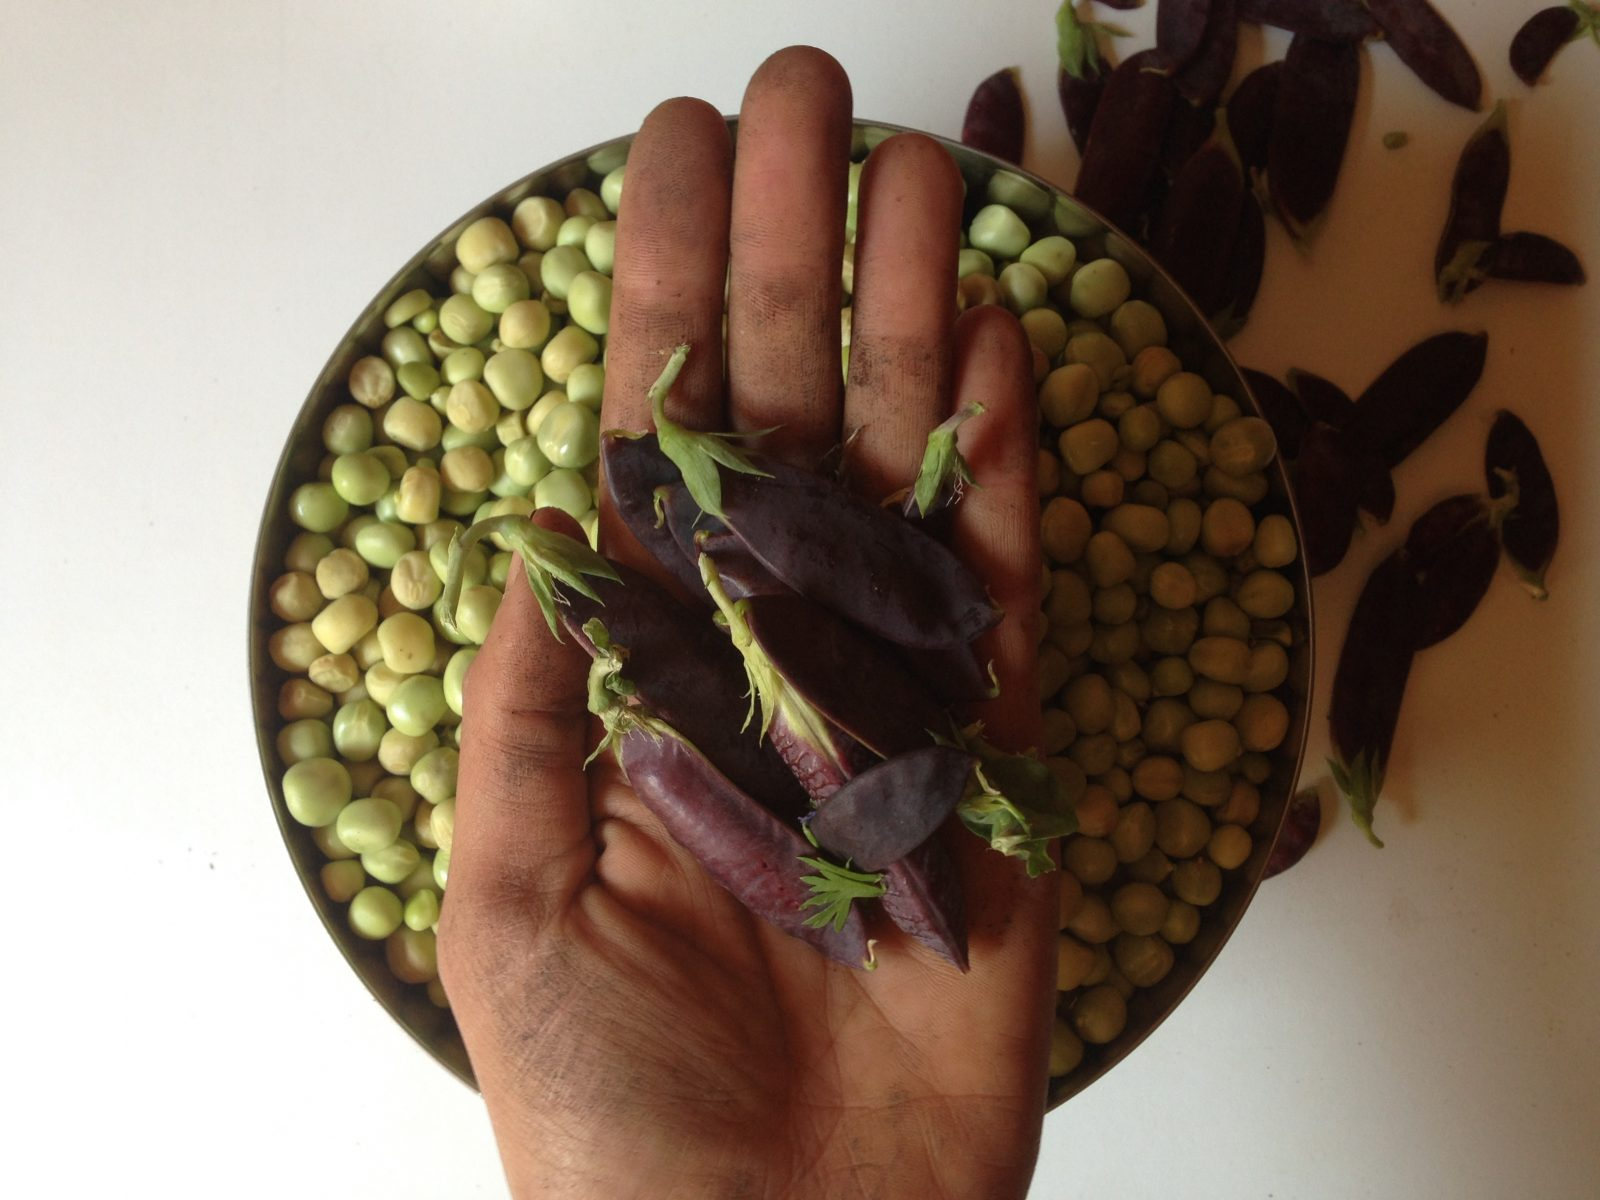 What? Purple peas?